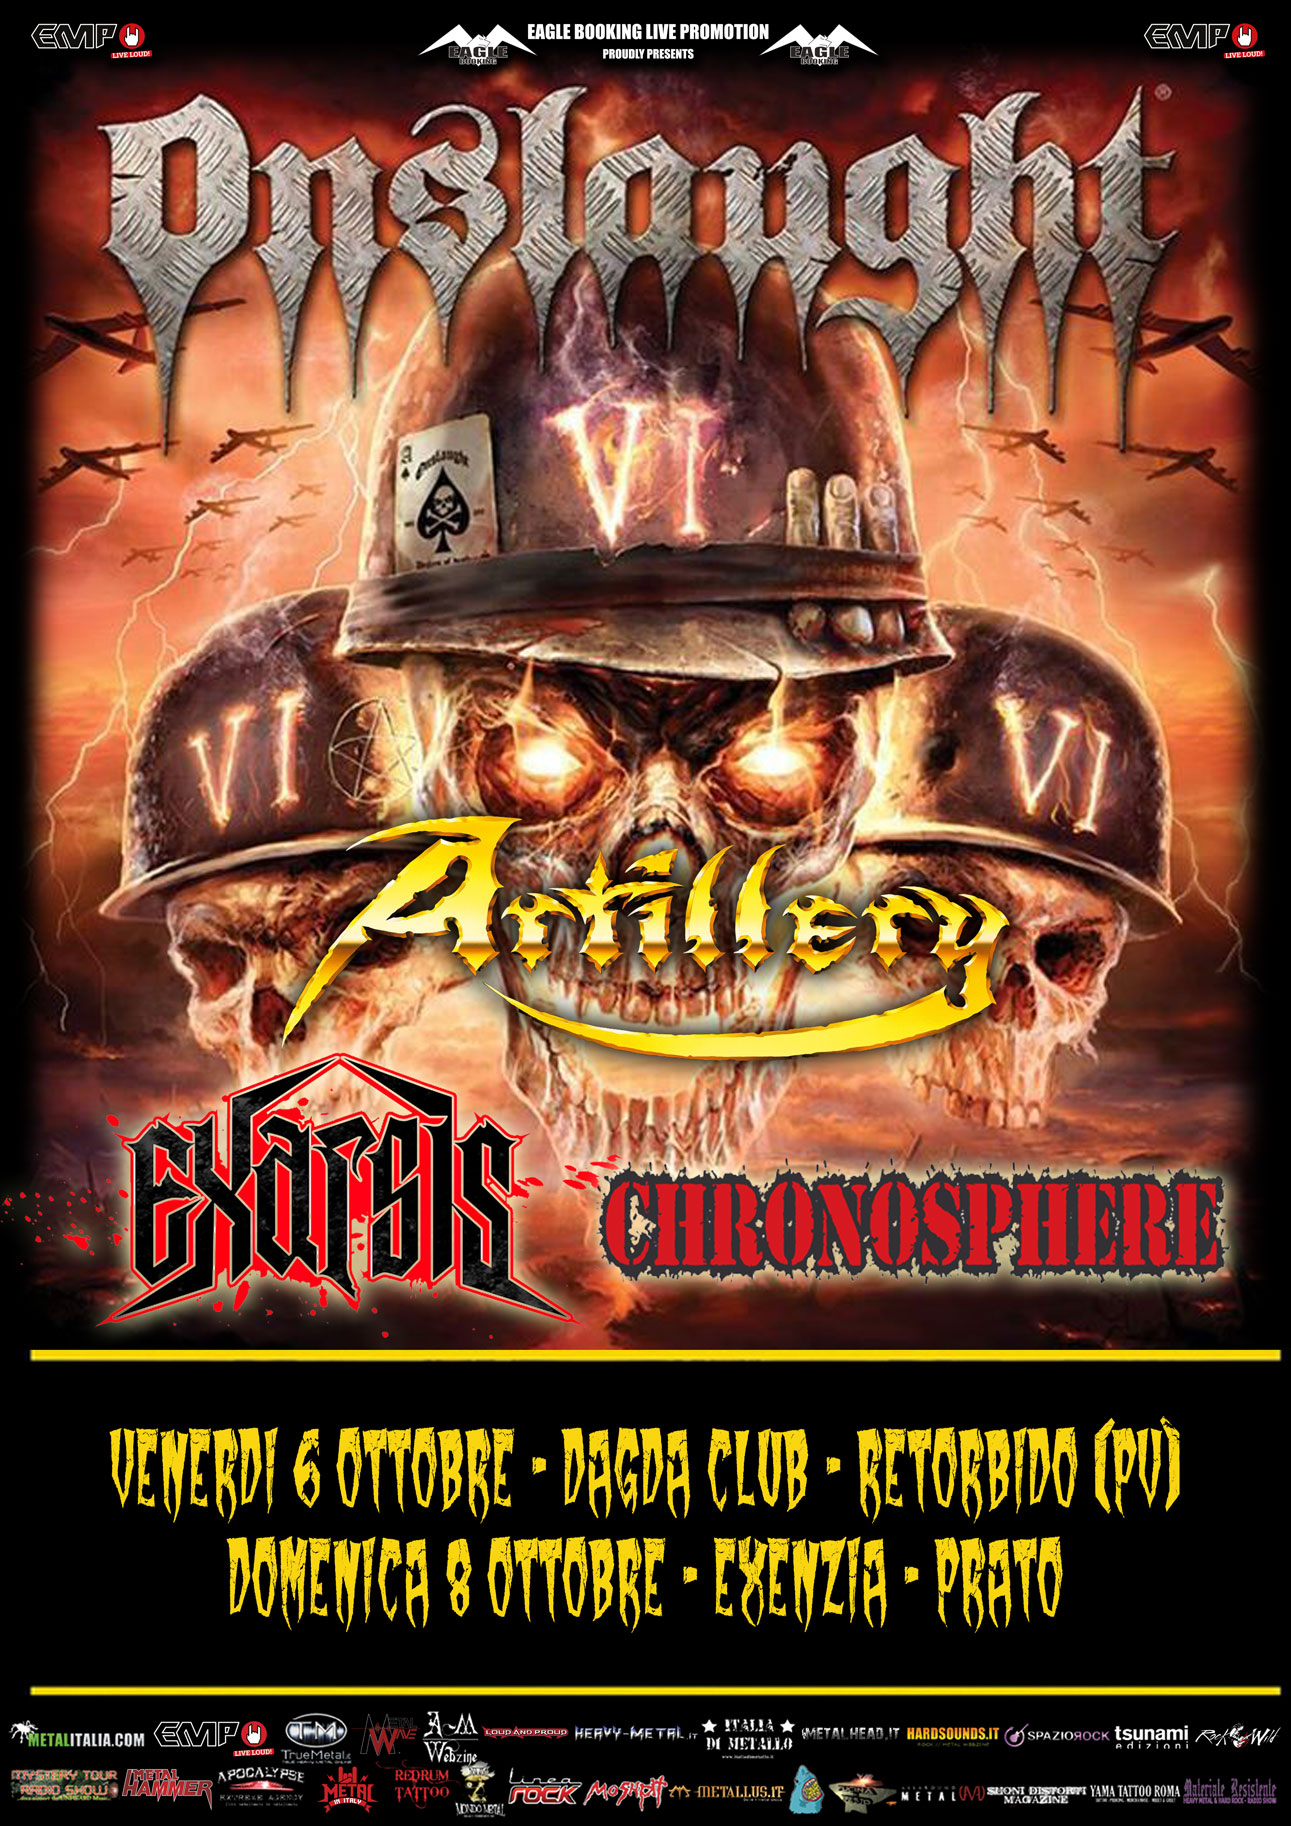 Onslaught - Artillery - Exarsis - Chrosphere - Tour 2017 - promo